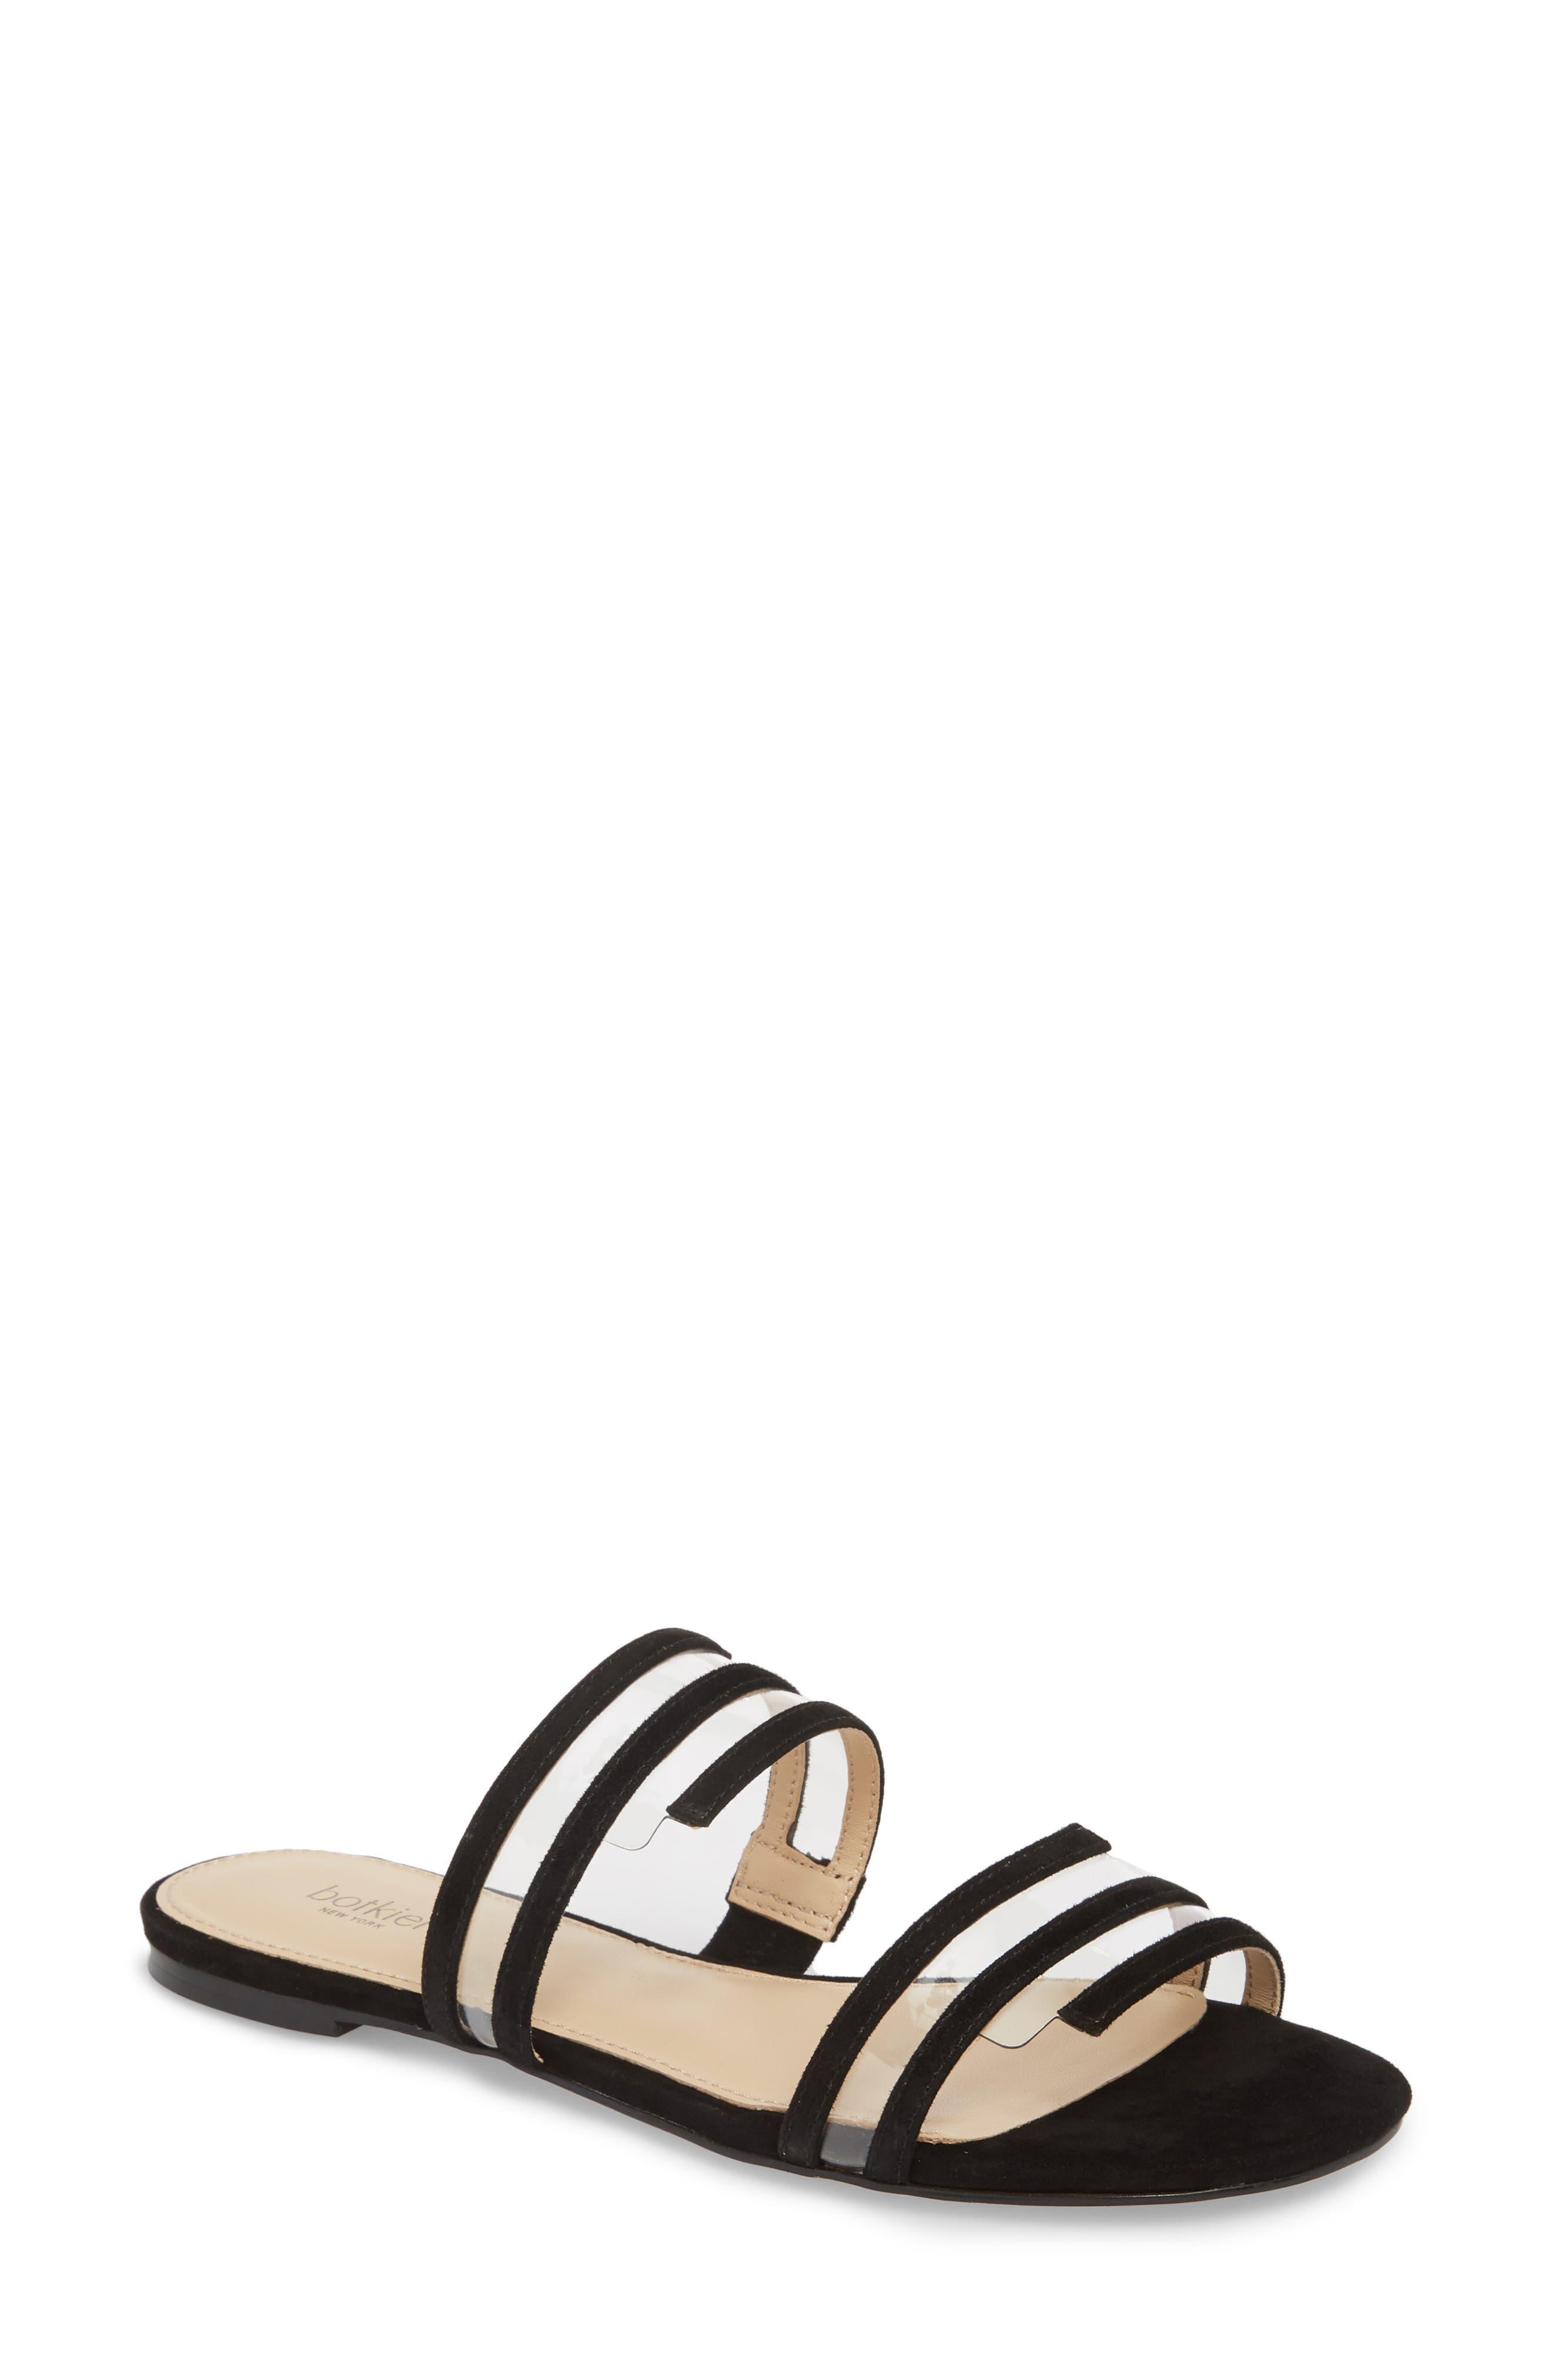 Maise Slide Sandal,                         Main,                         color, BLACK SUEDE